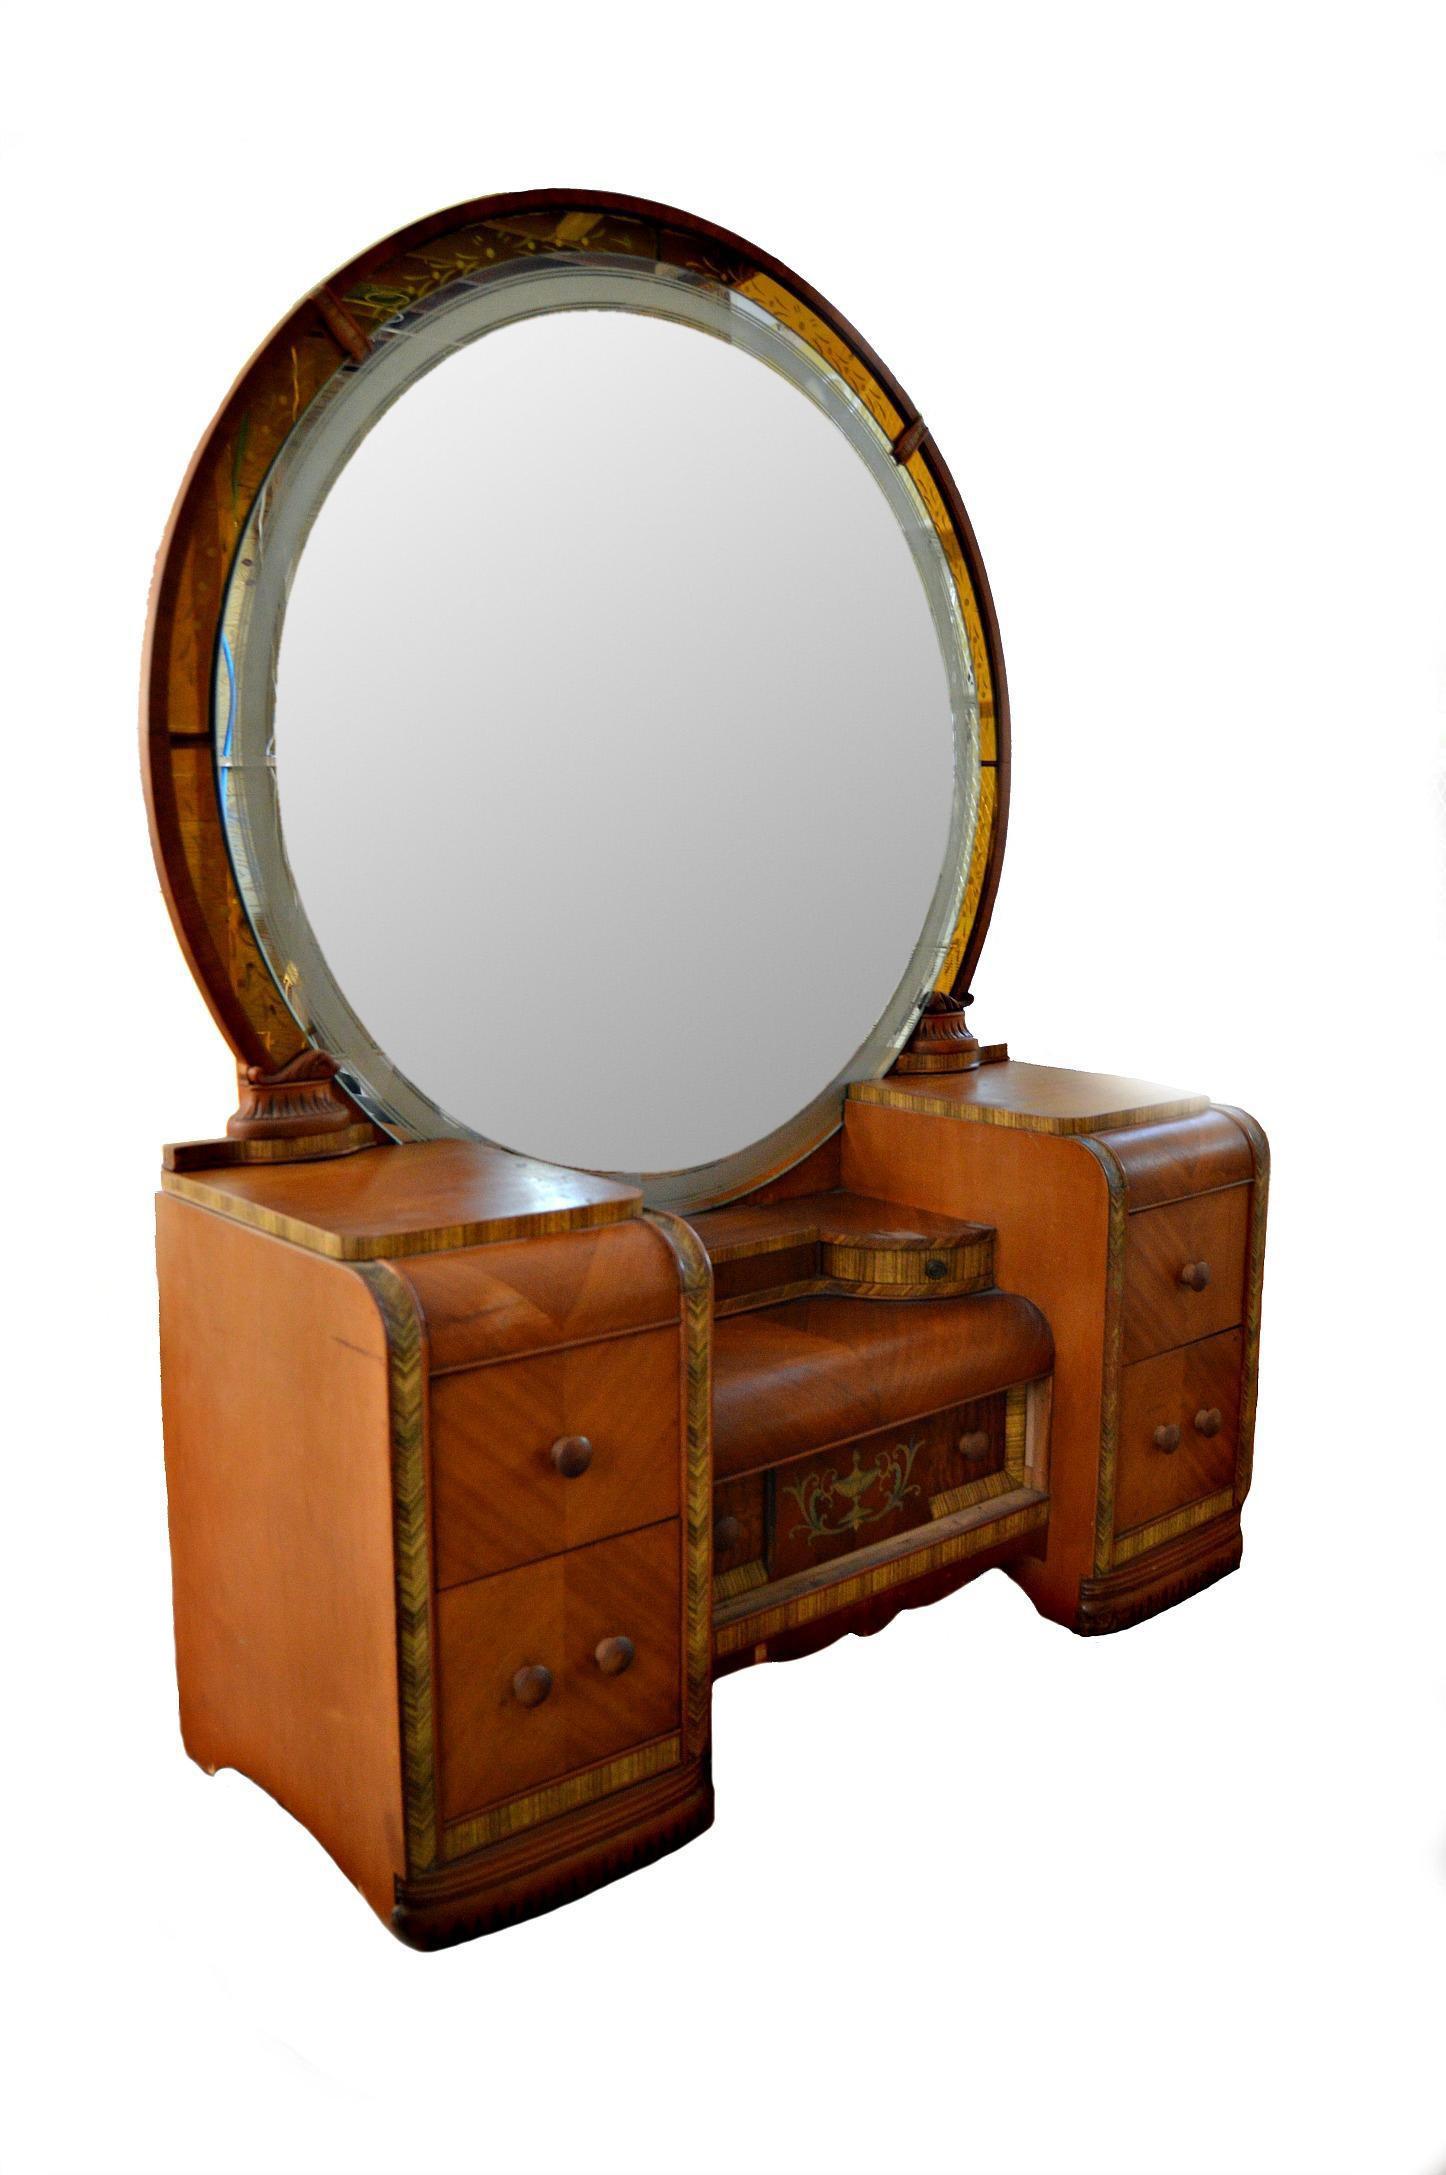 vintage vanity desk with mirror. Vintage Art Deco Waterfall Vanity Desk  Mirror Image 1 of 8 Shabby here there